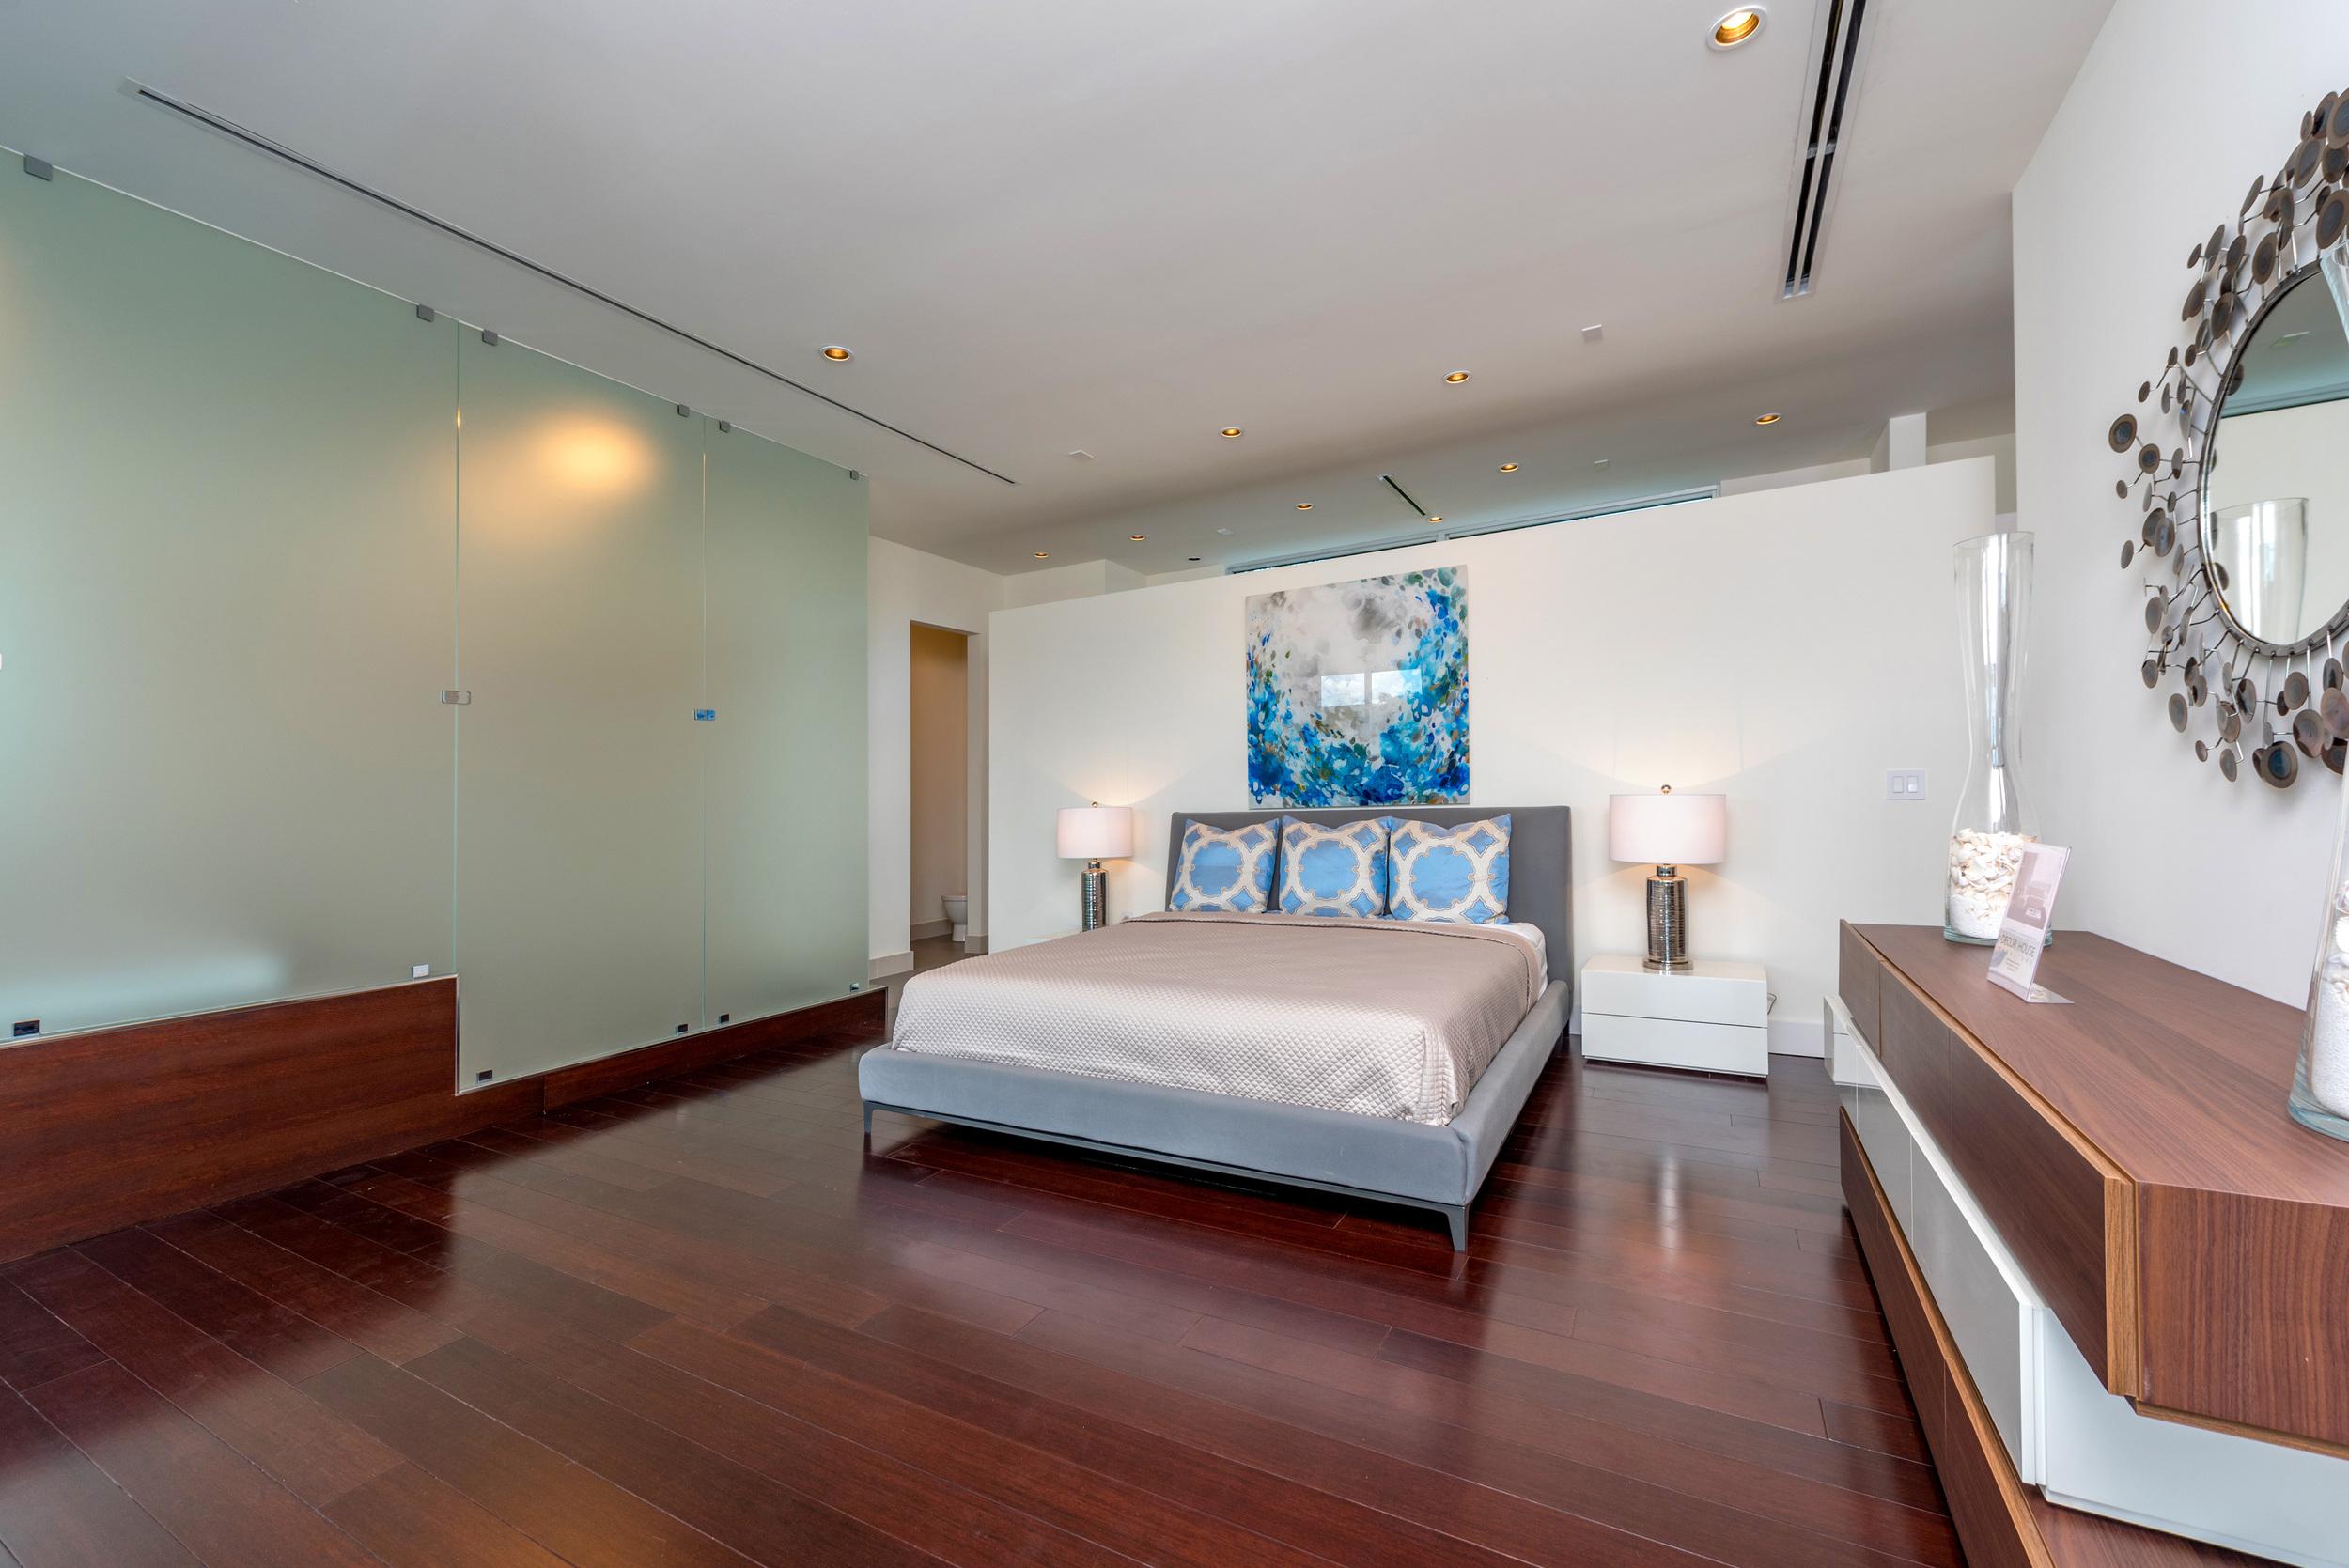 The Setting Homes Plum House Miami Florida Interior Master Bedroom TARIS Real Estate